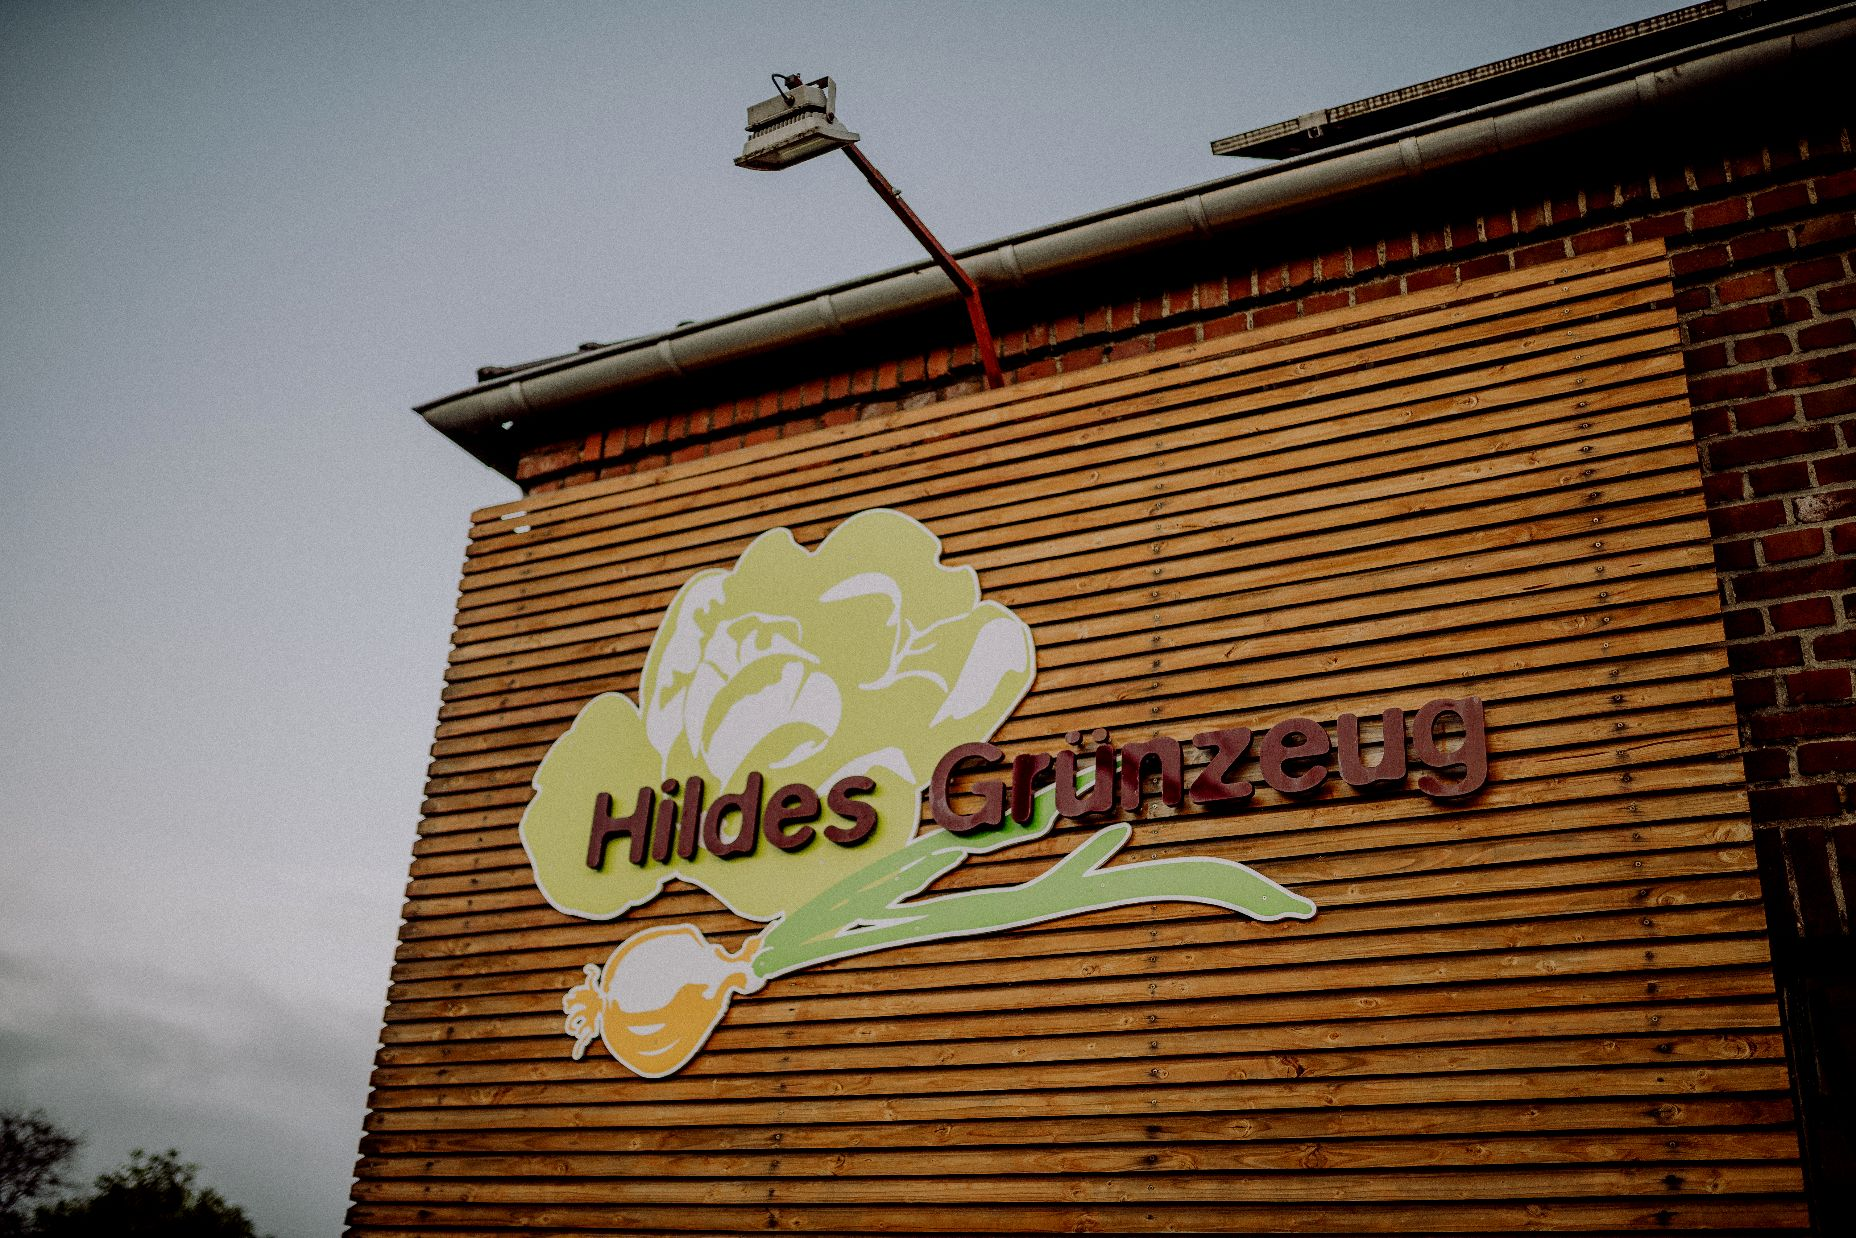 HildesGrünzeug GmbH Co